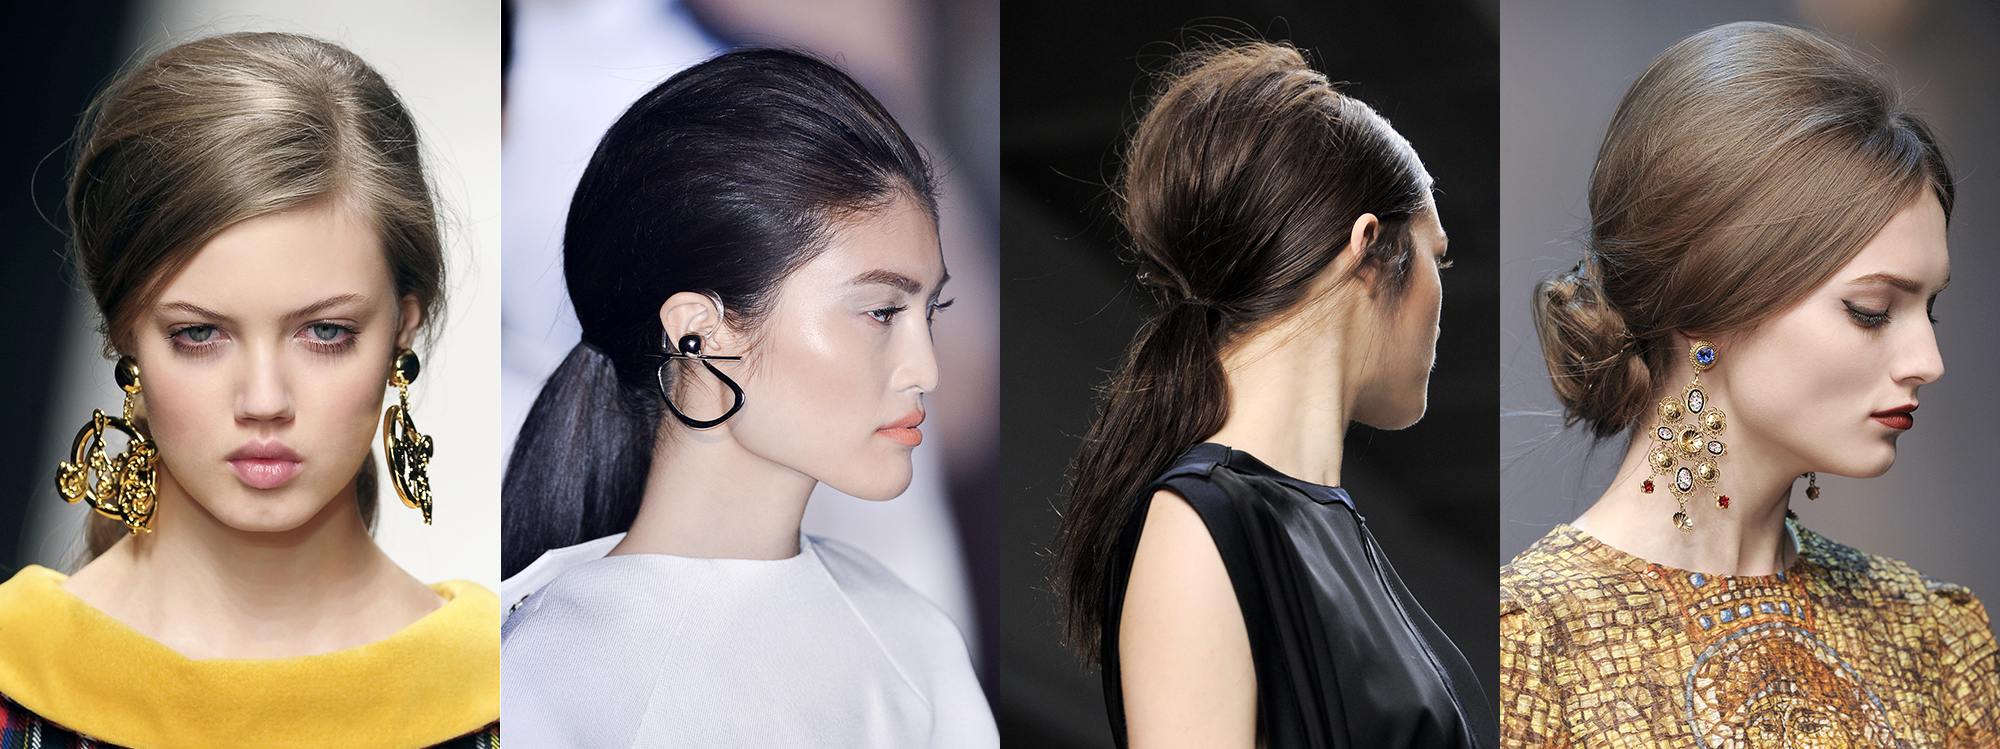 Moschino, Thierry Mugler, Rabih Kayrouz, Dolce & Gabbana